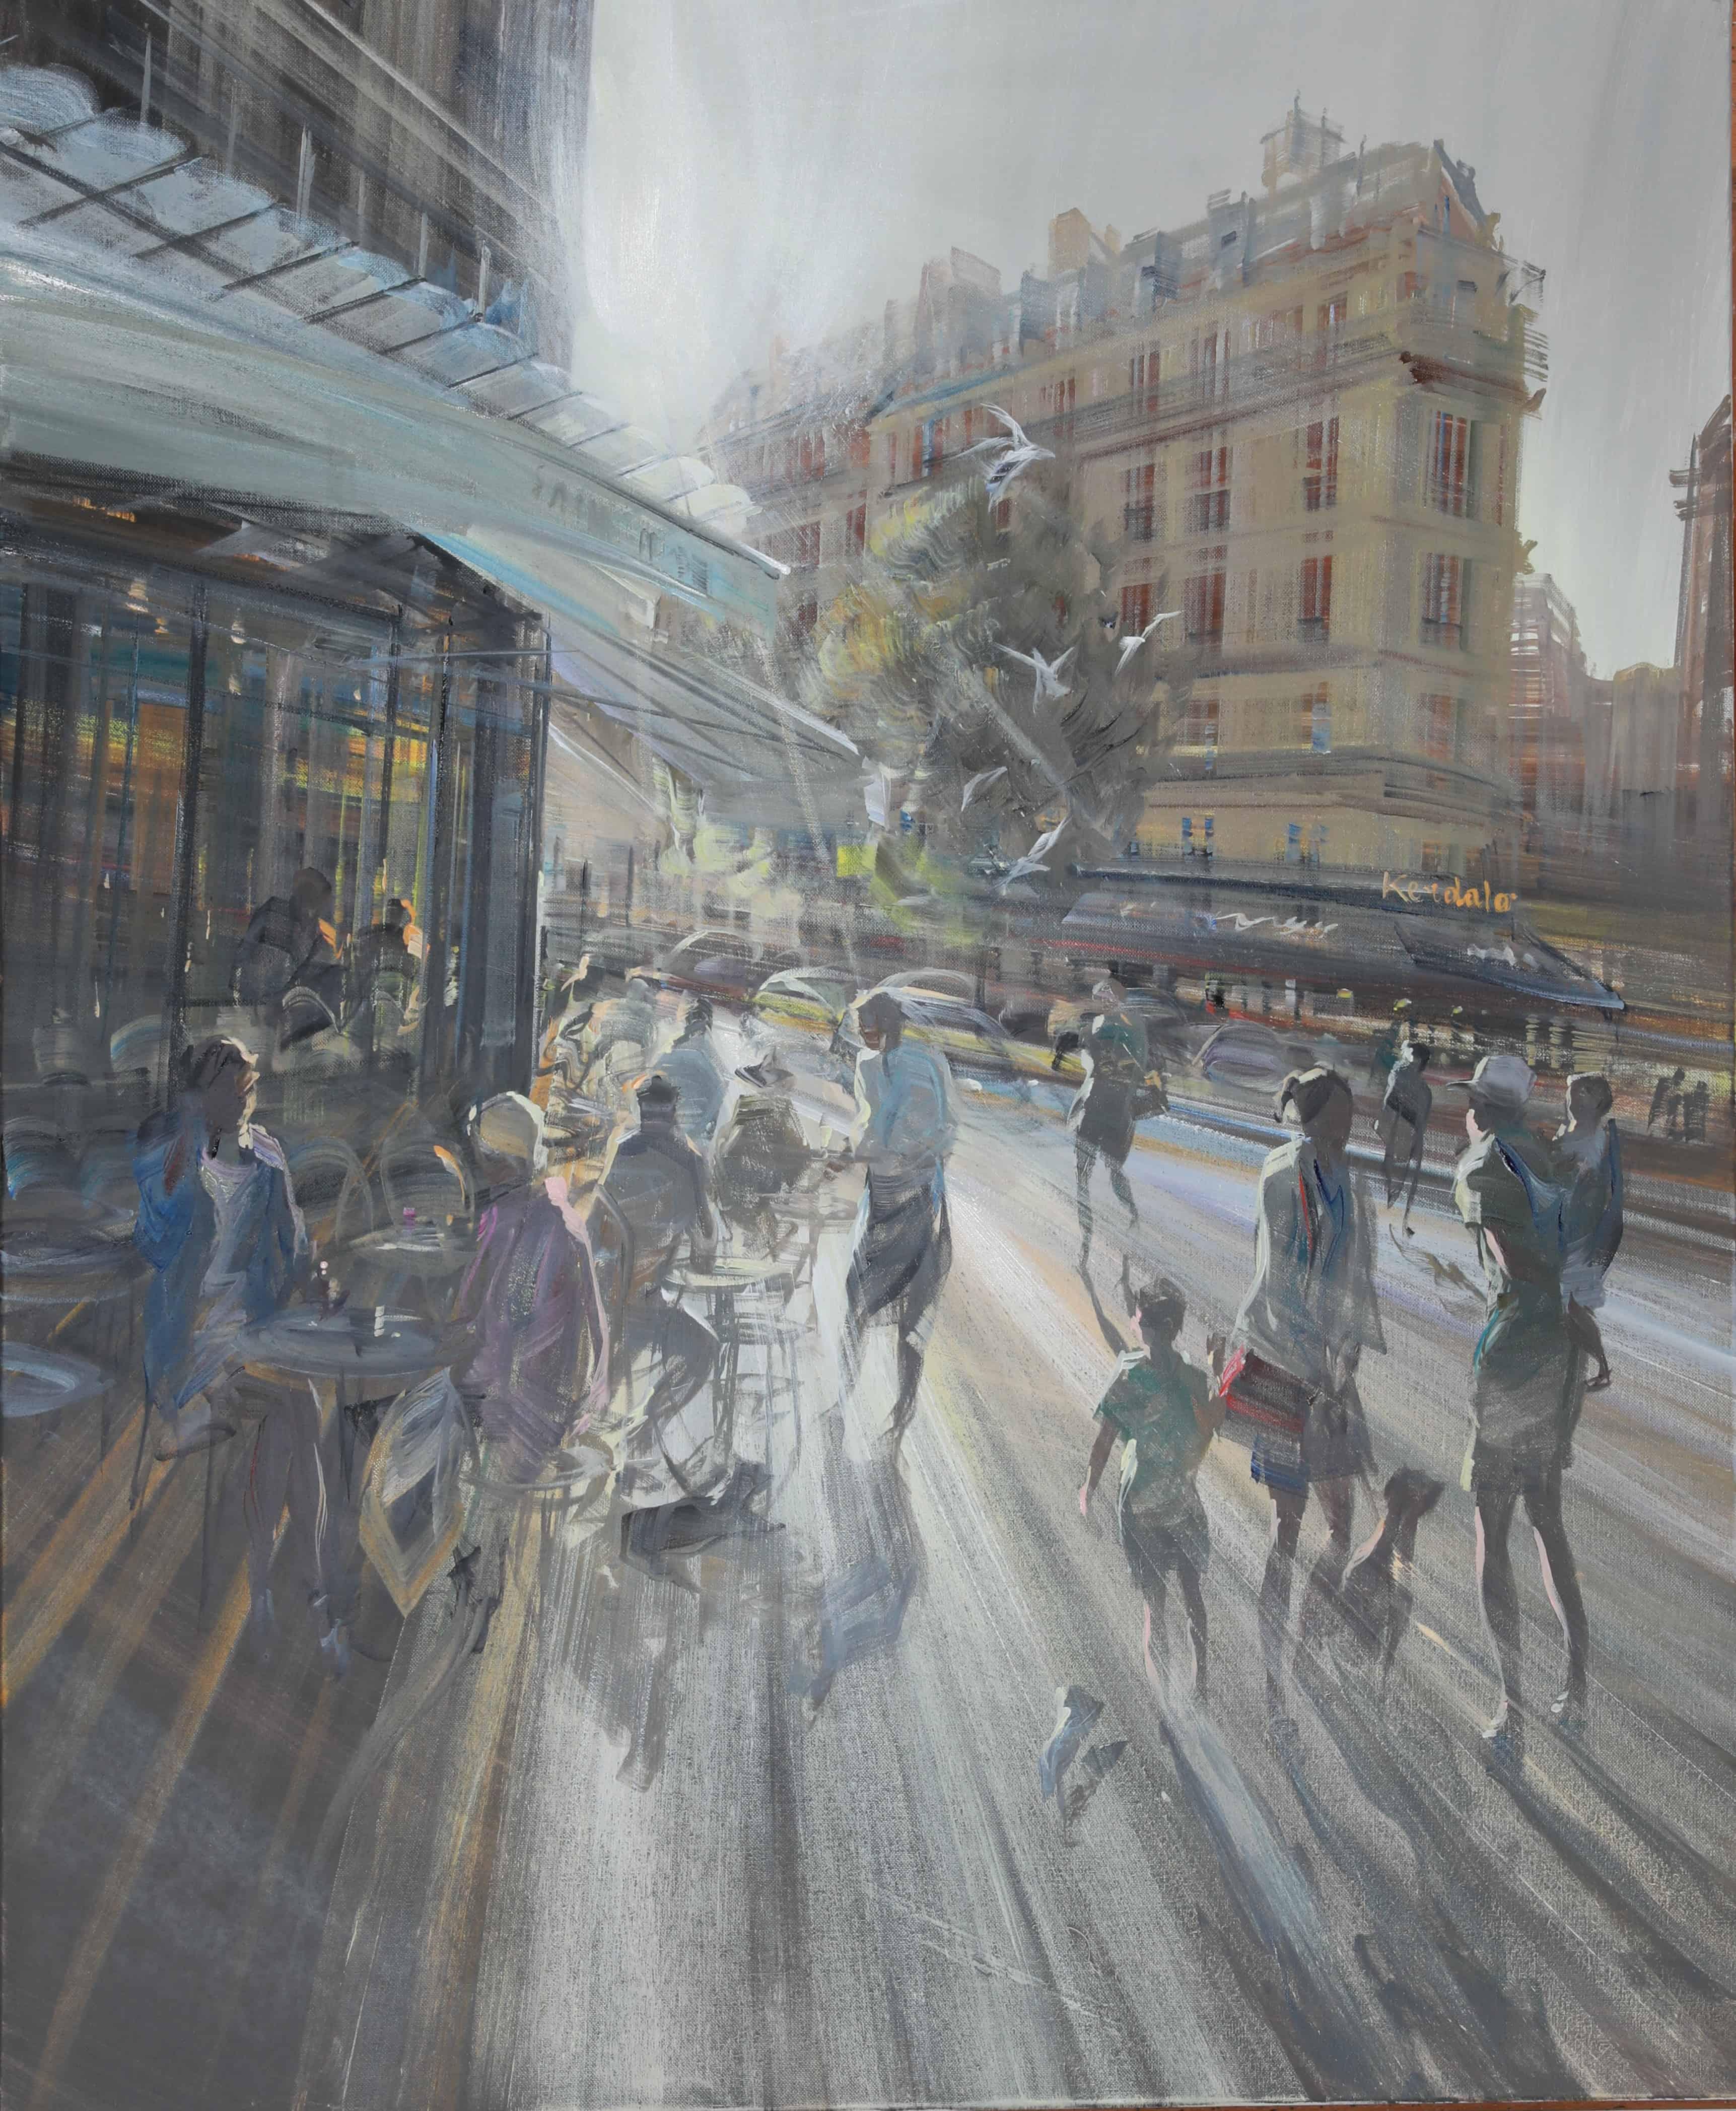 KERDALO Artiste Peintre Galerie d'Art Sylvie Platini Lyon Annecy